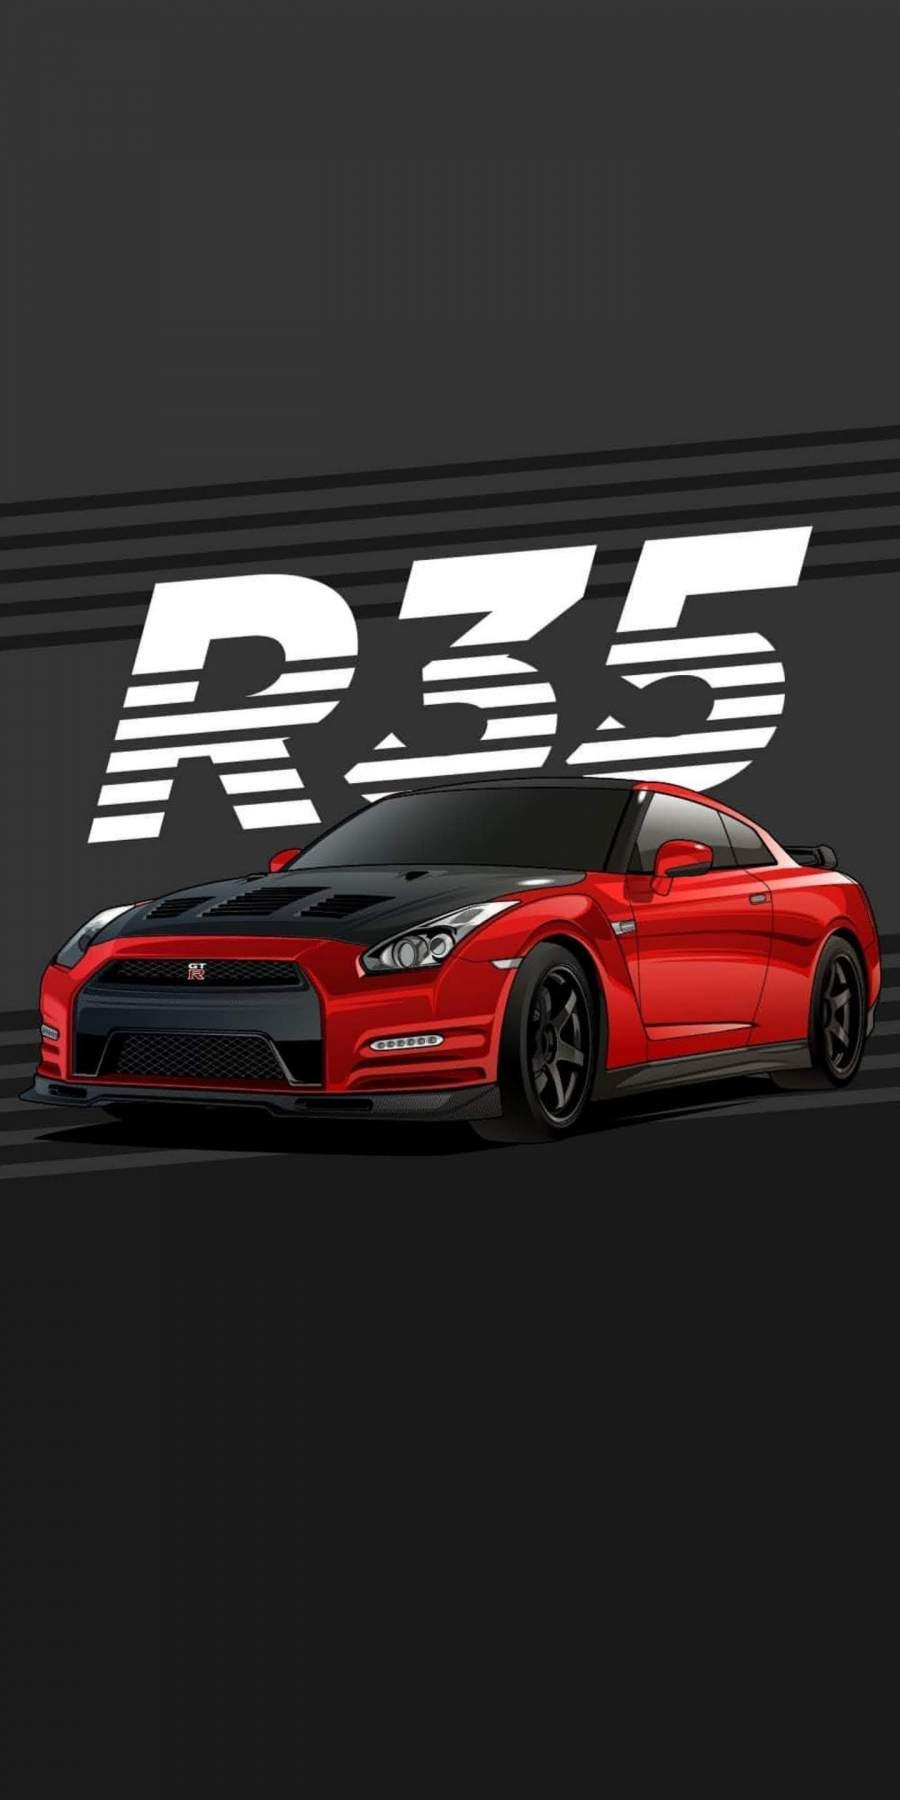 R 35 GTR iPhone Wallpaper